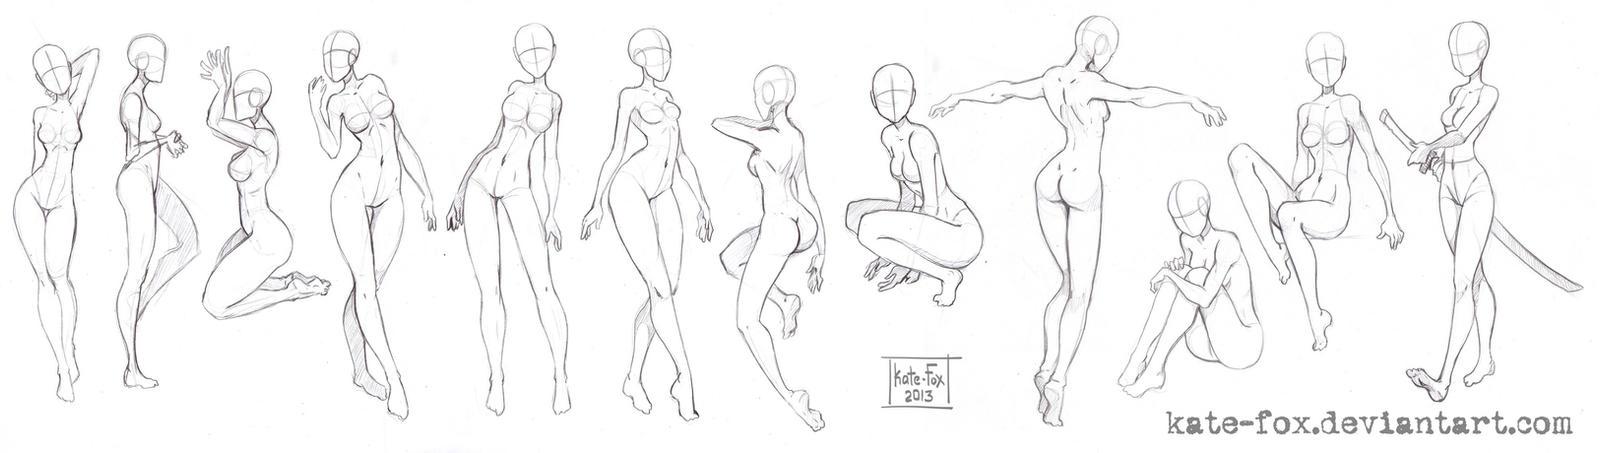 Pose study6